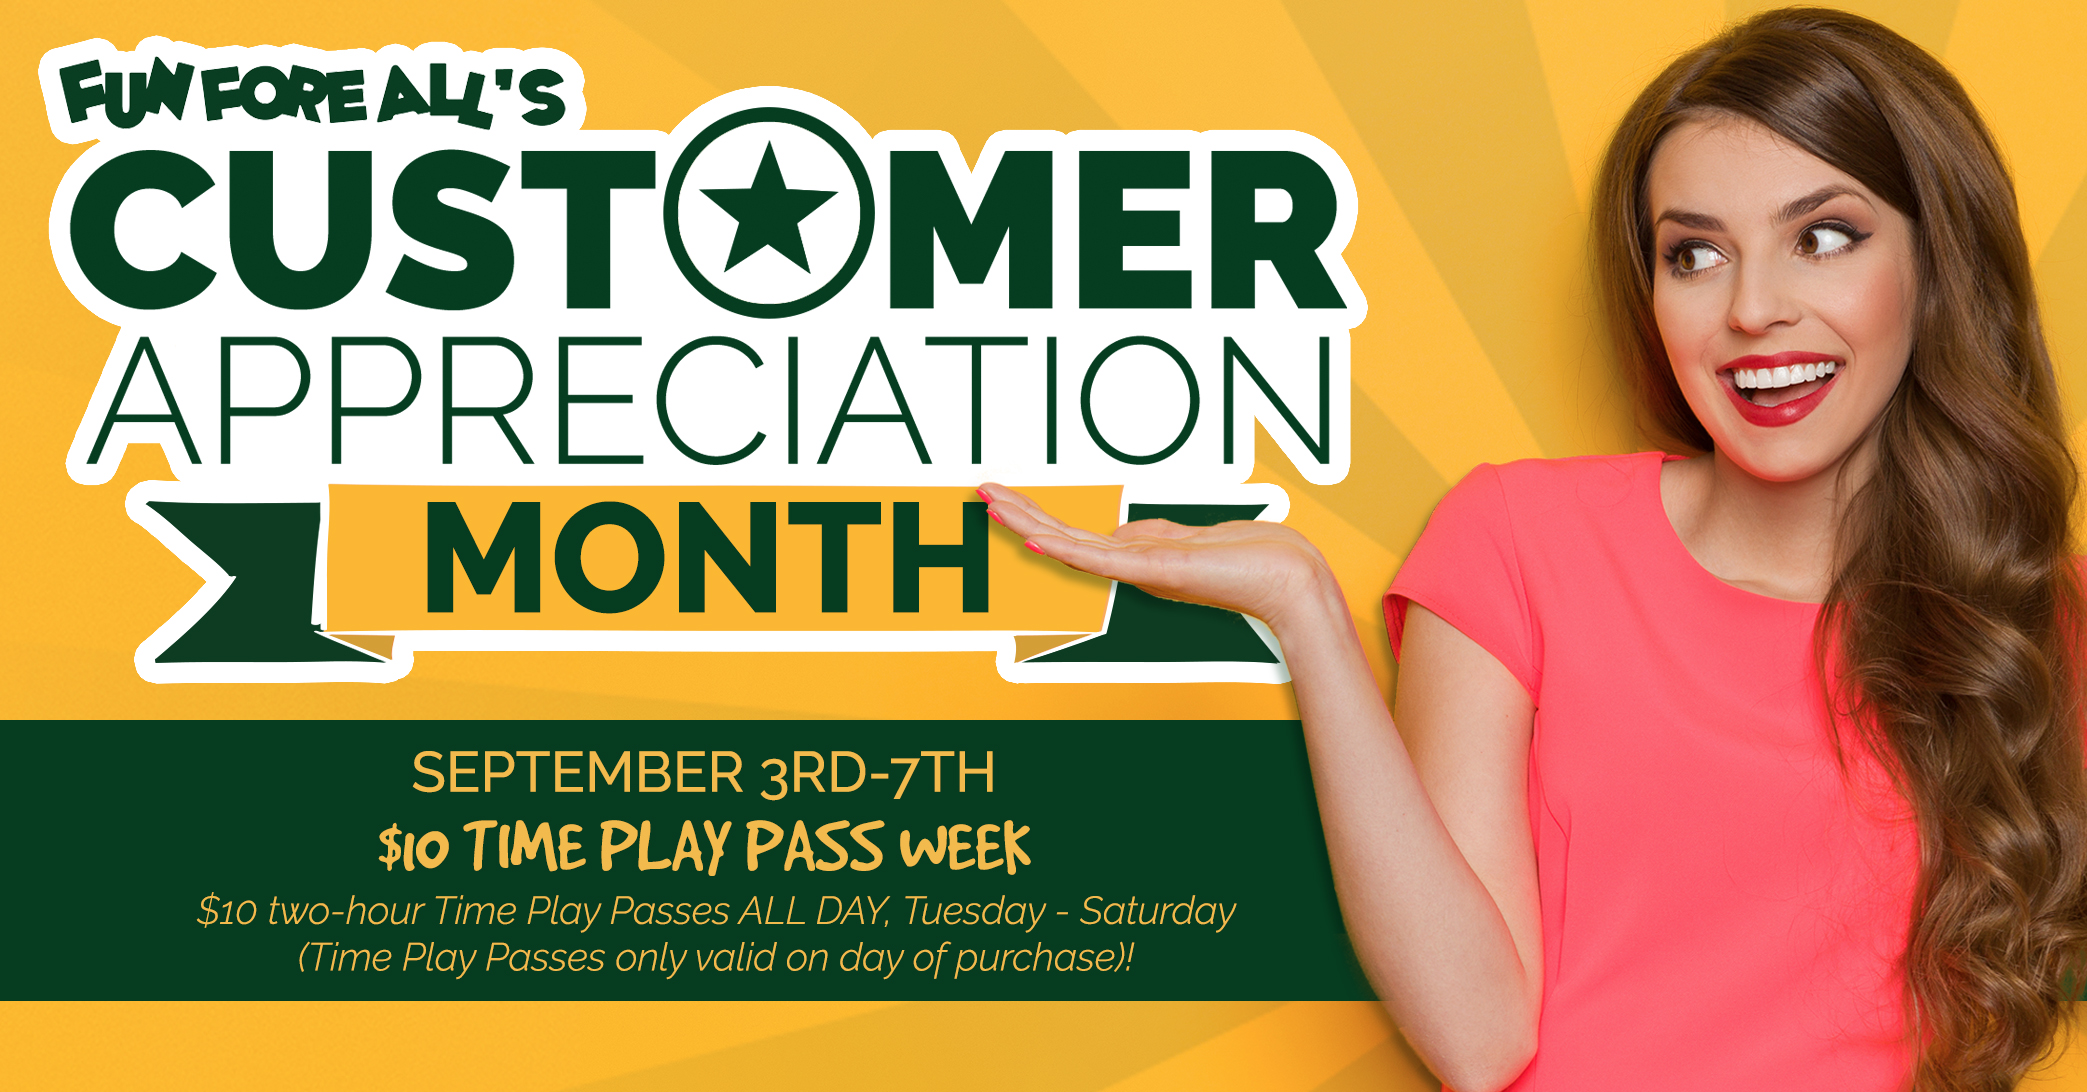 Facebook Invite (Customer Appreciation Month) $10 Time Play Week 2019.jpg